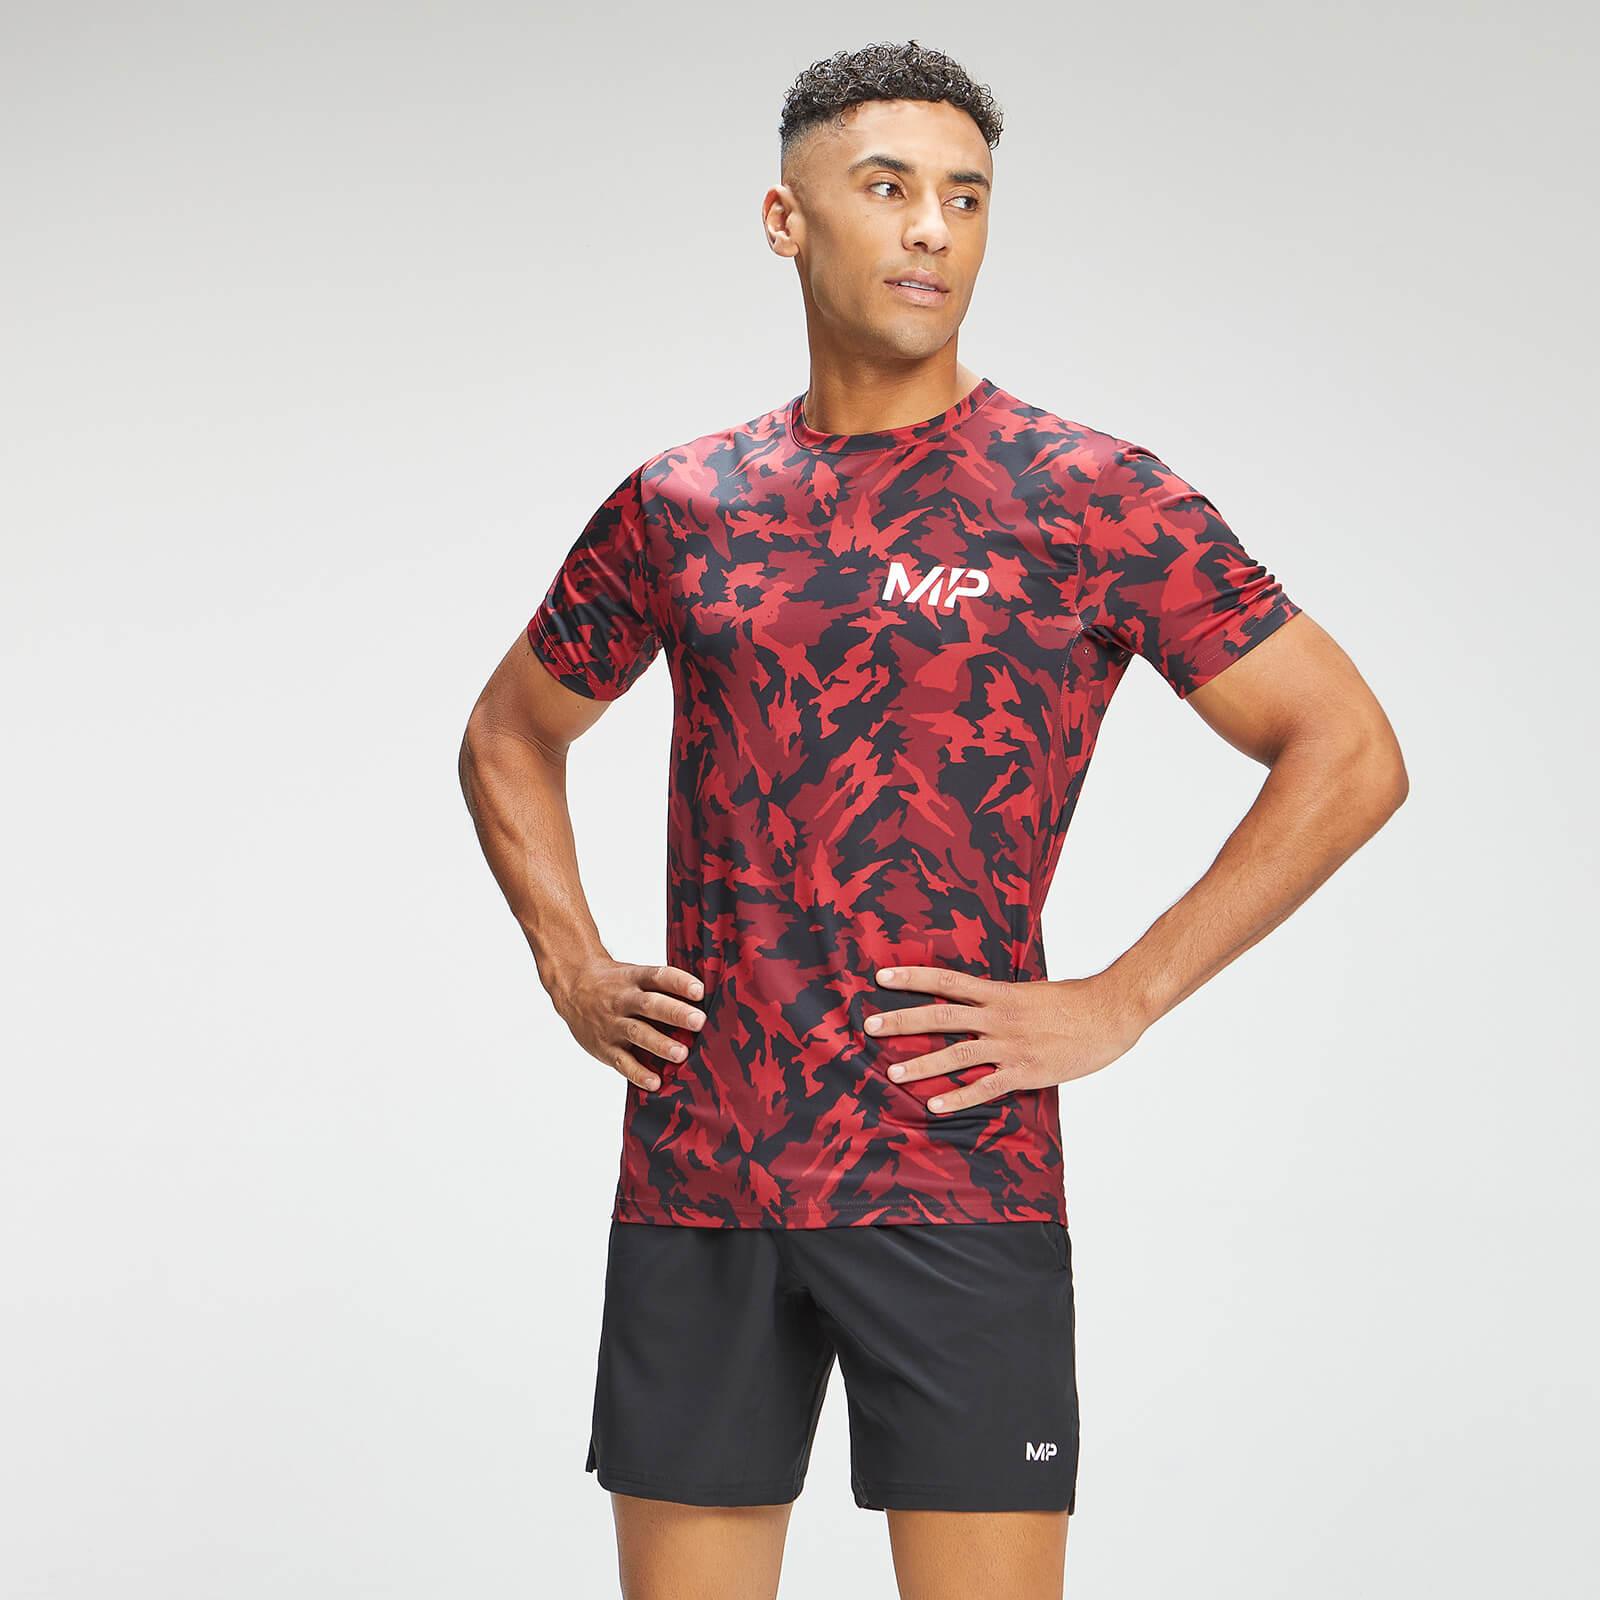 MP Men's Adapt Camo Short Sleeve T-Shirt- Red Camo - S, Myprotein International  - купить со скидкой